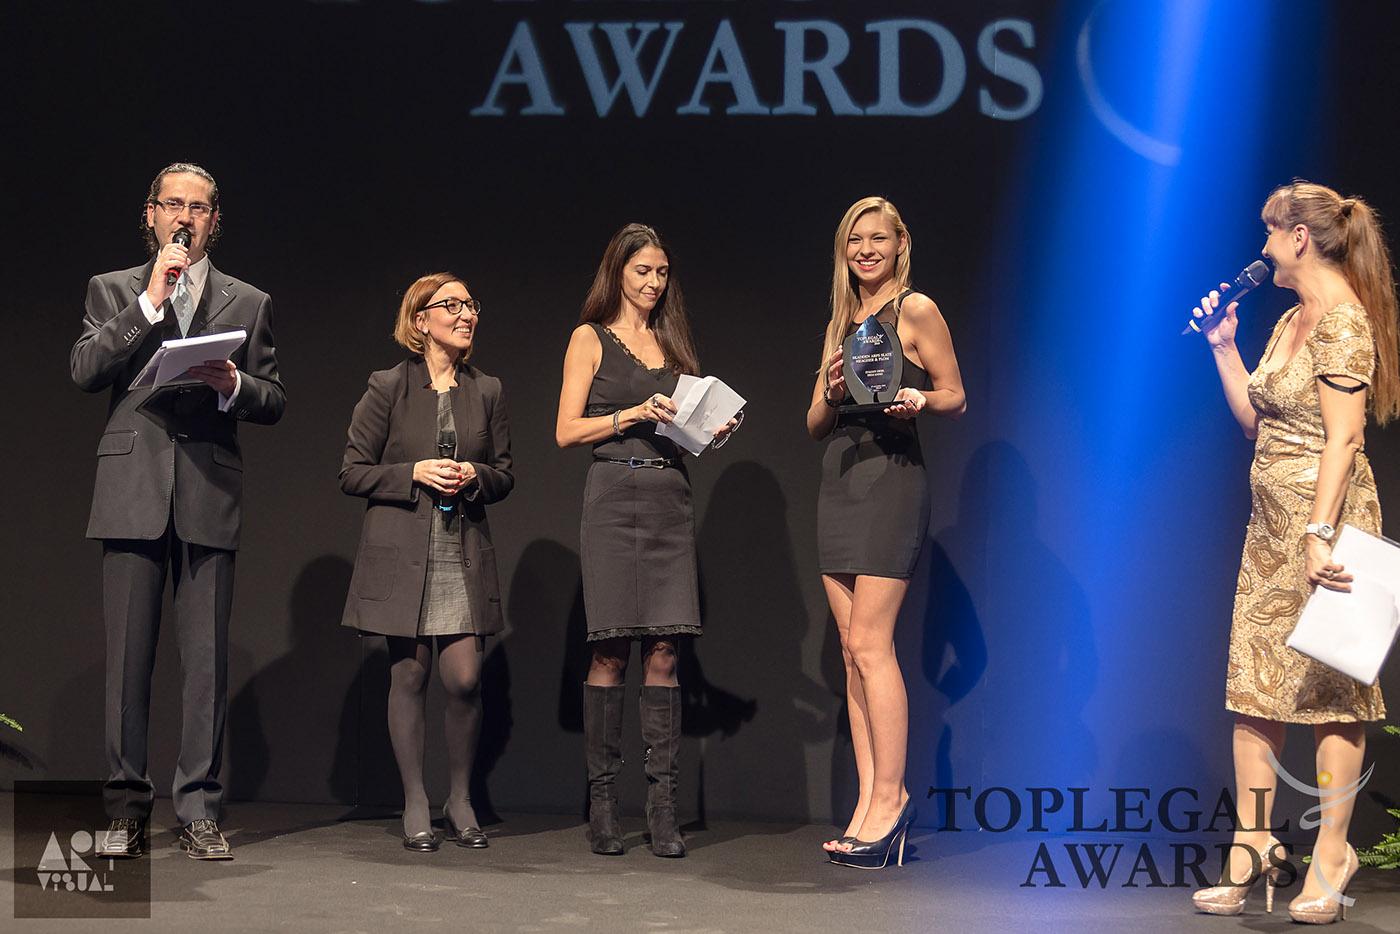 Top Legal TopLegal Awards top legal awards avvocati milano corporate photographer milan event photographer corporate event milano event photographer